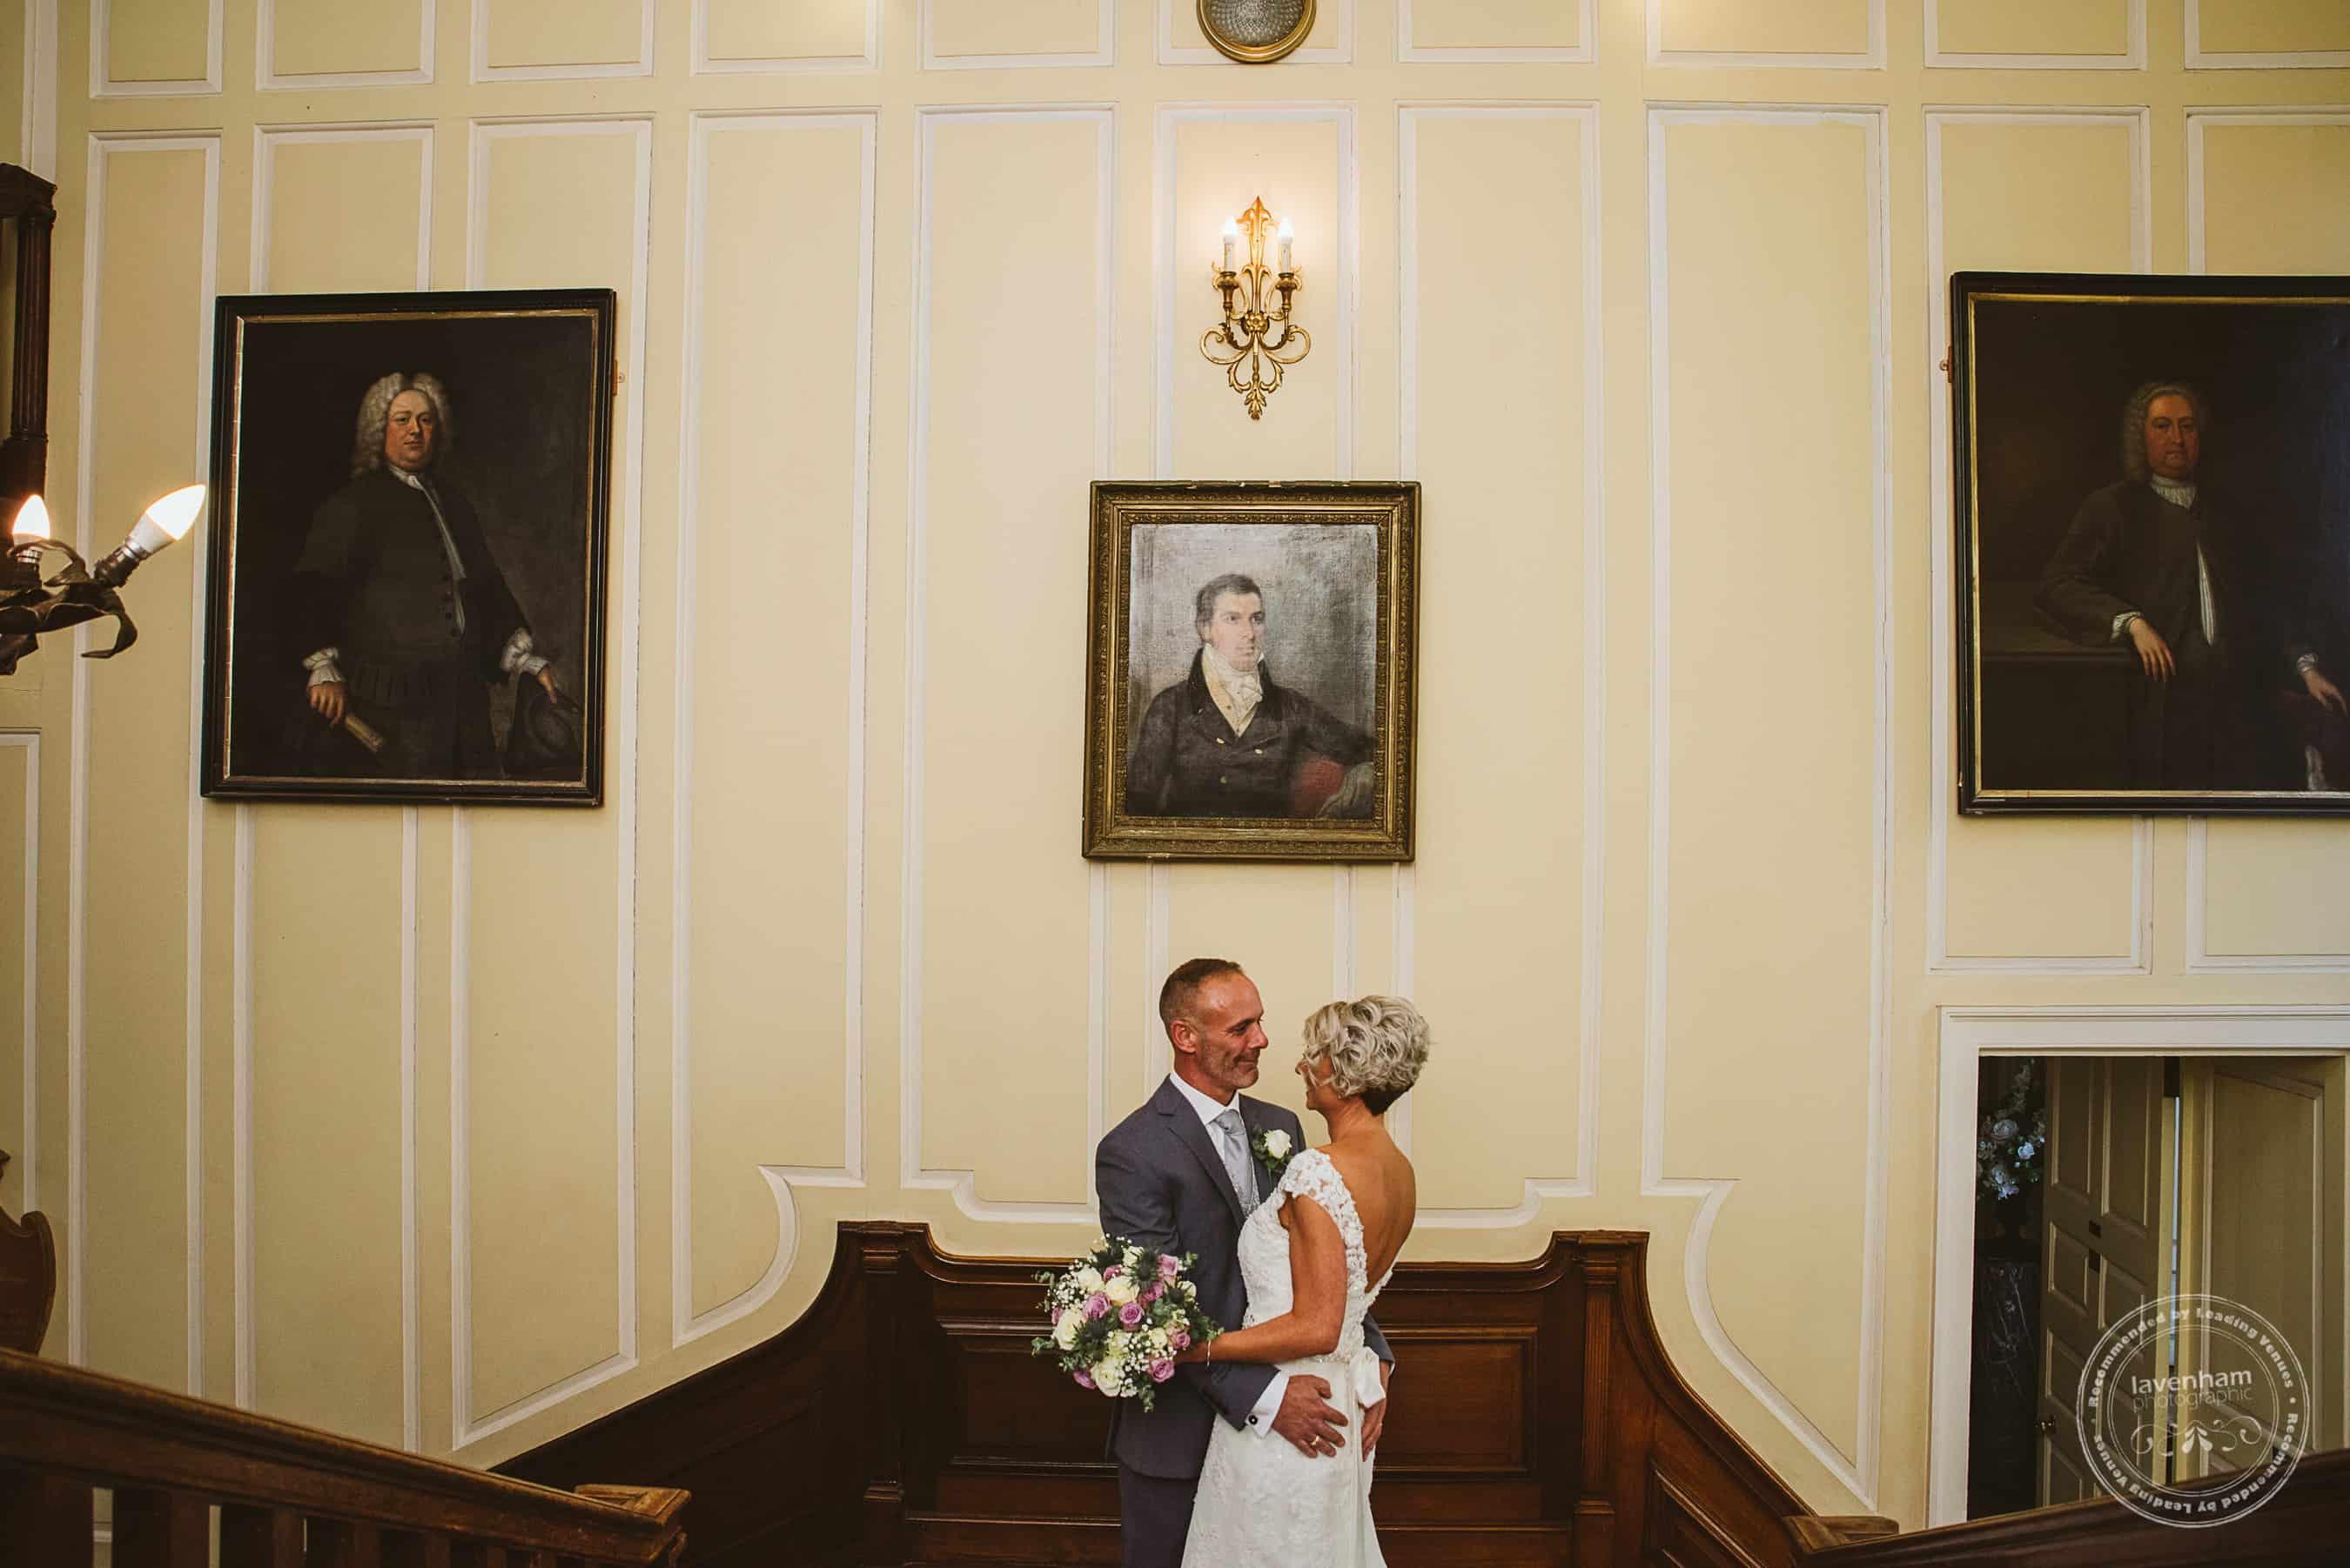 281018 Gosfield Hall Wedding Photography Lavenham Photographic 061